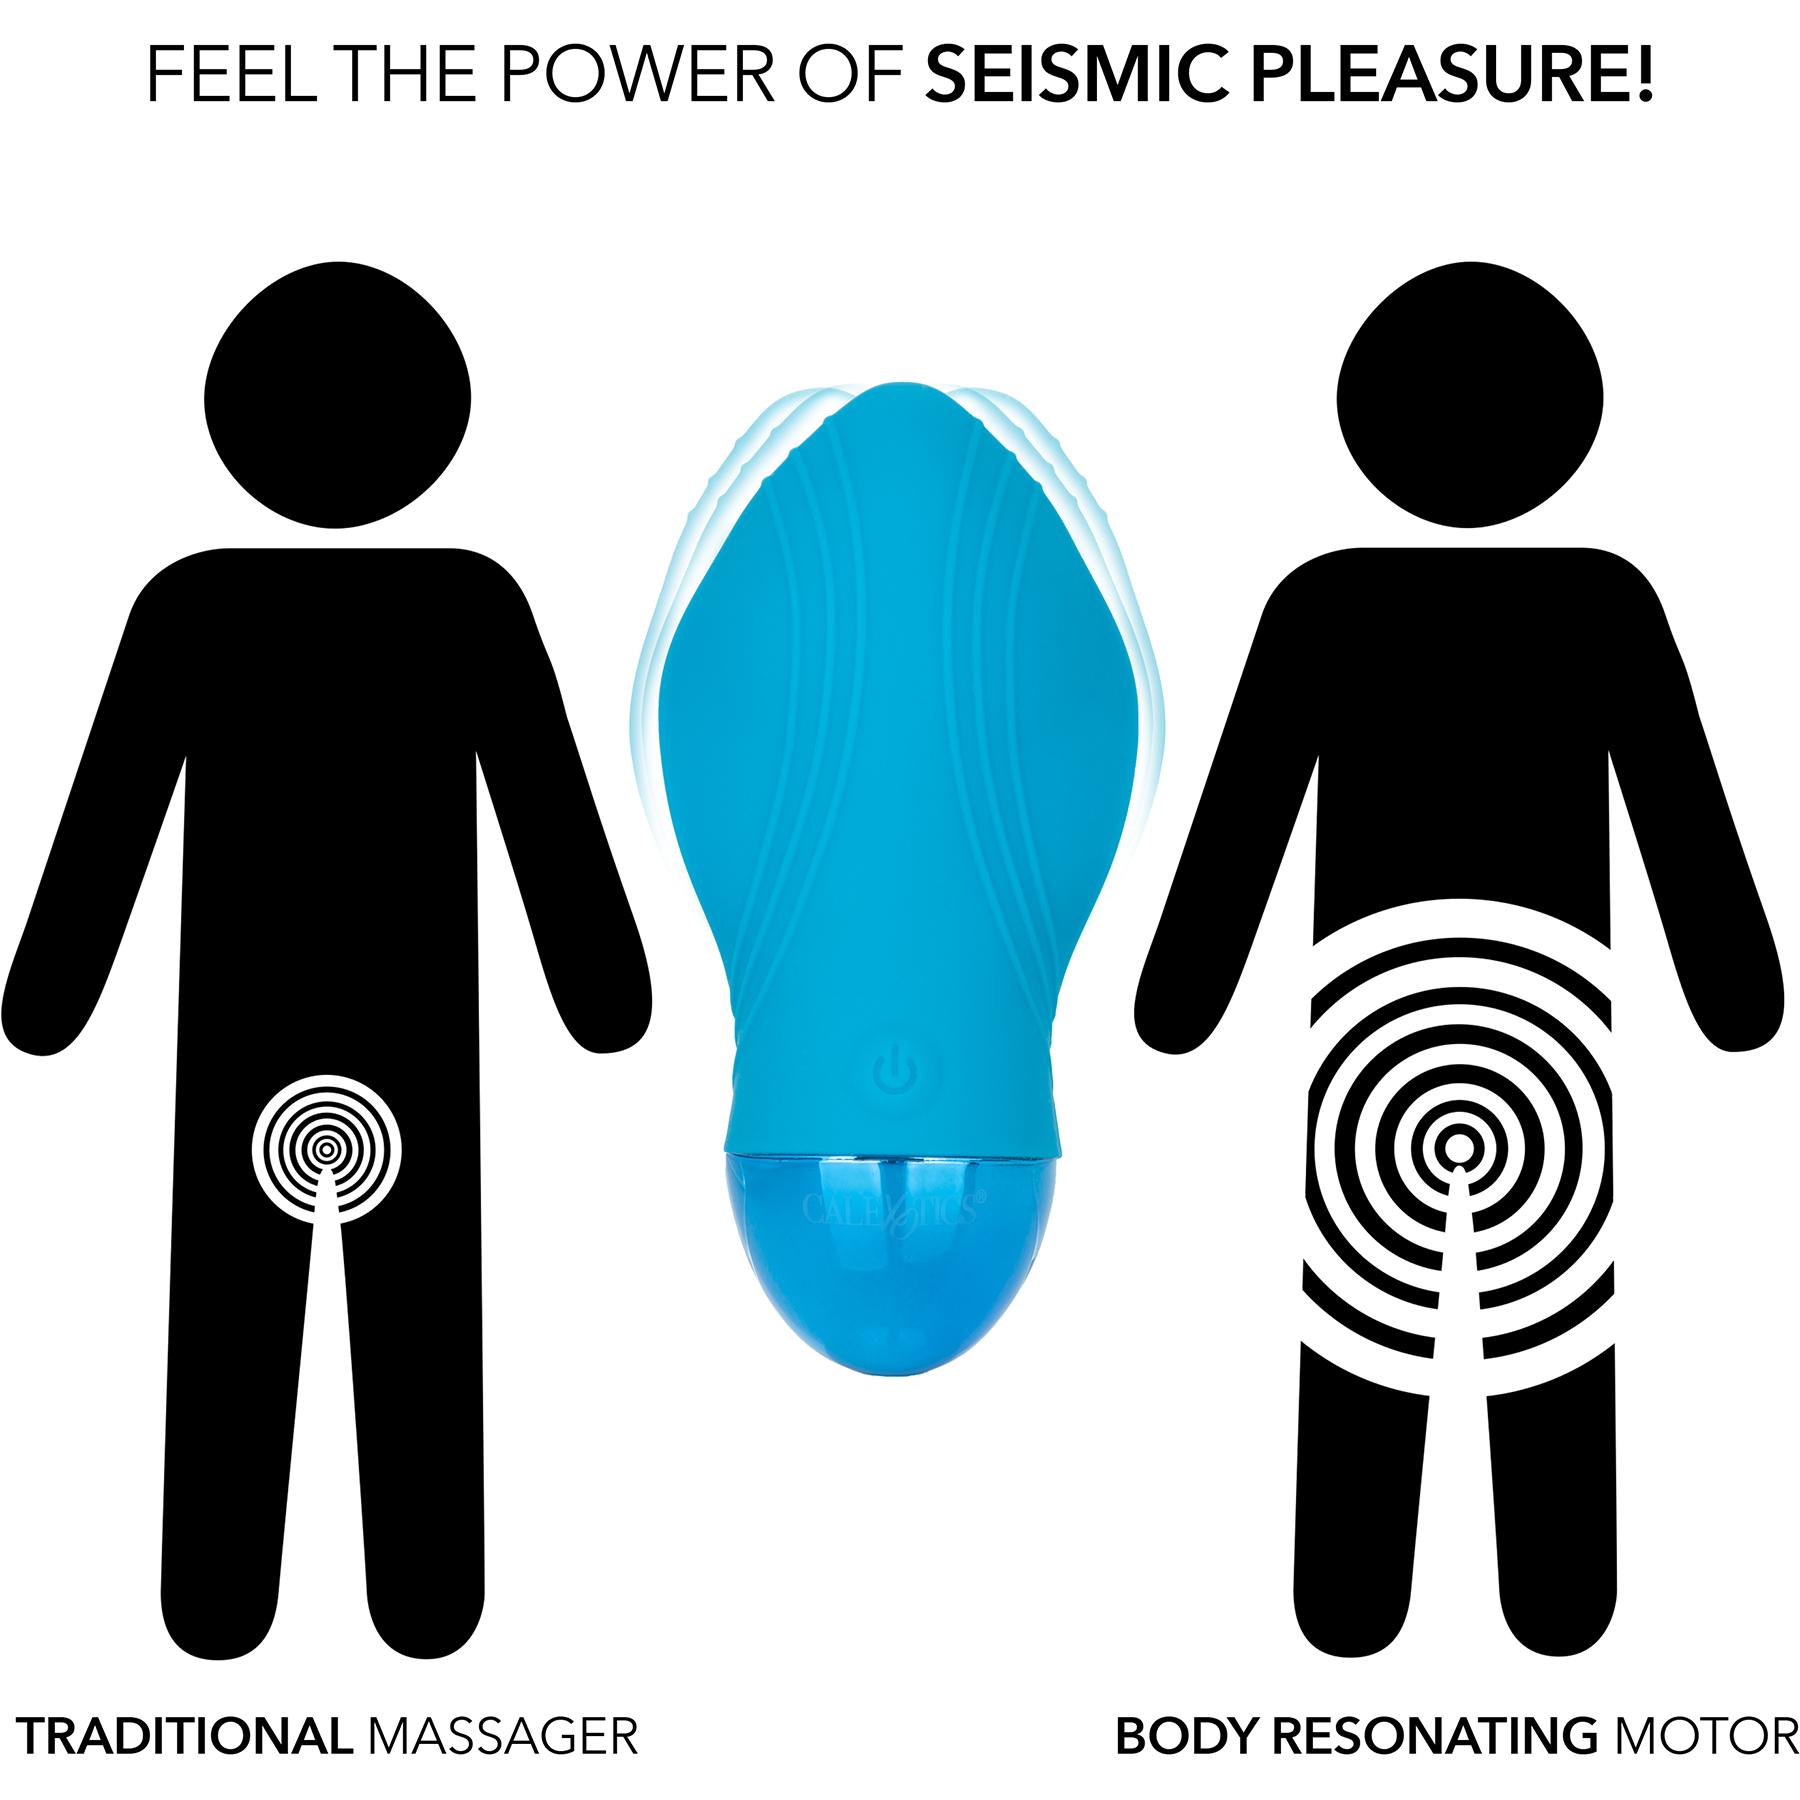 Tremble Kiss Waterproof Rechargeable Silicone Seismic Vibrator - Comparison